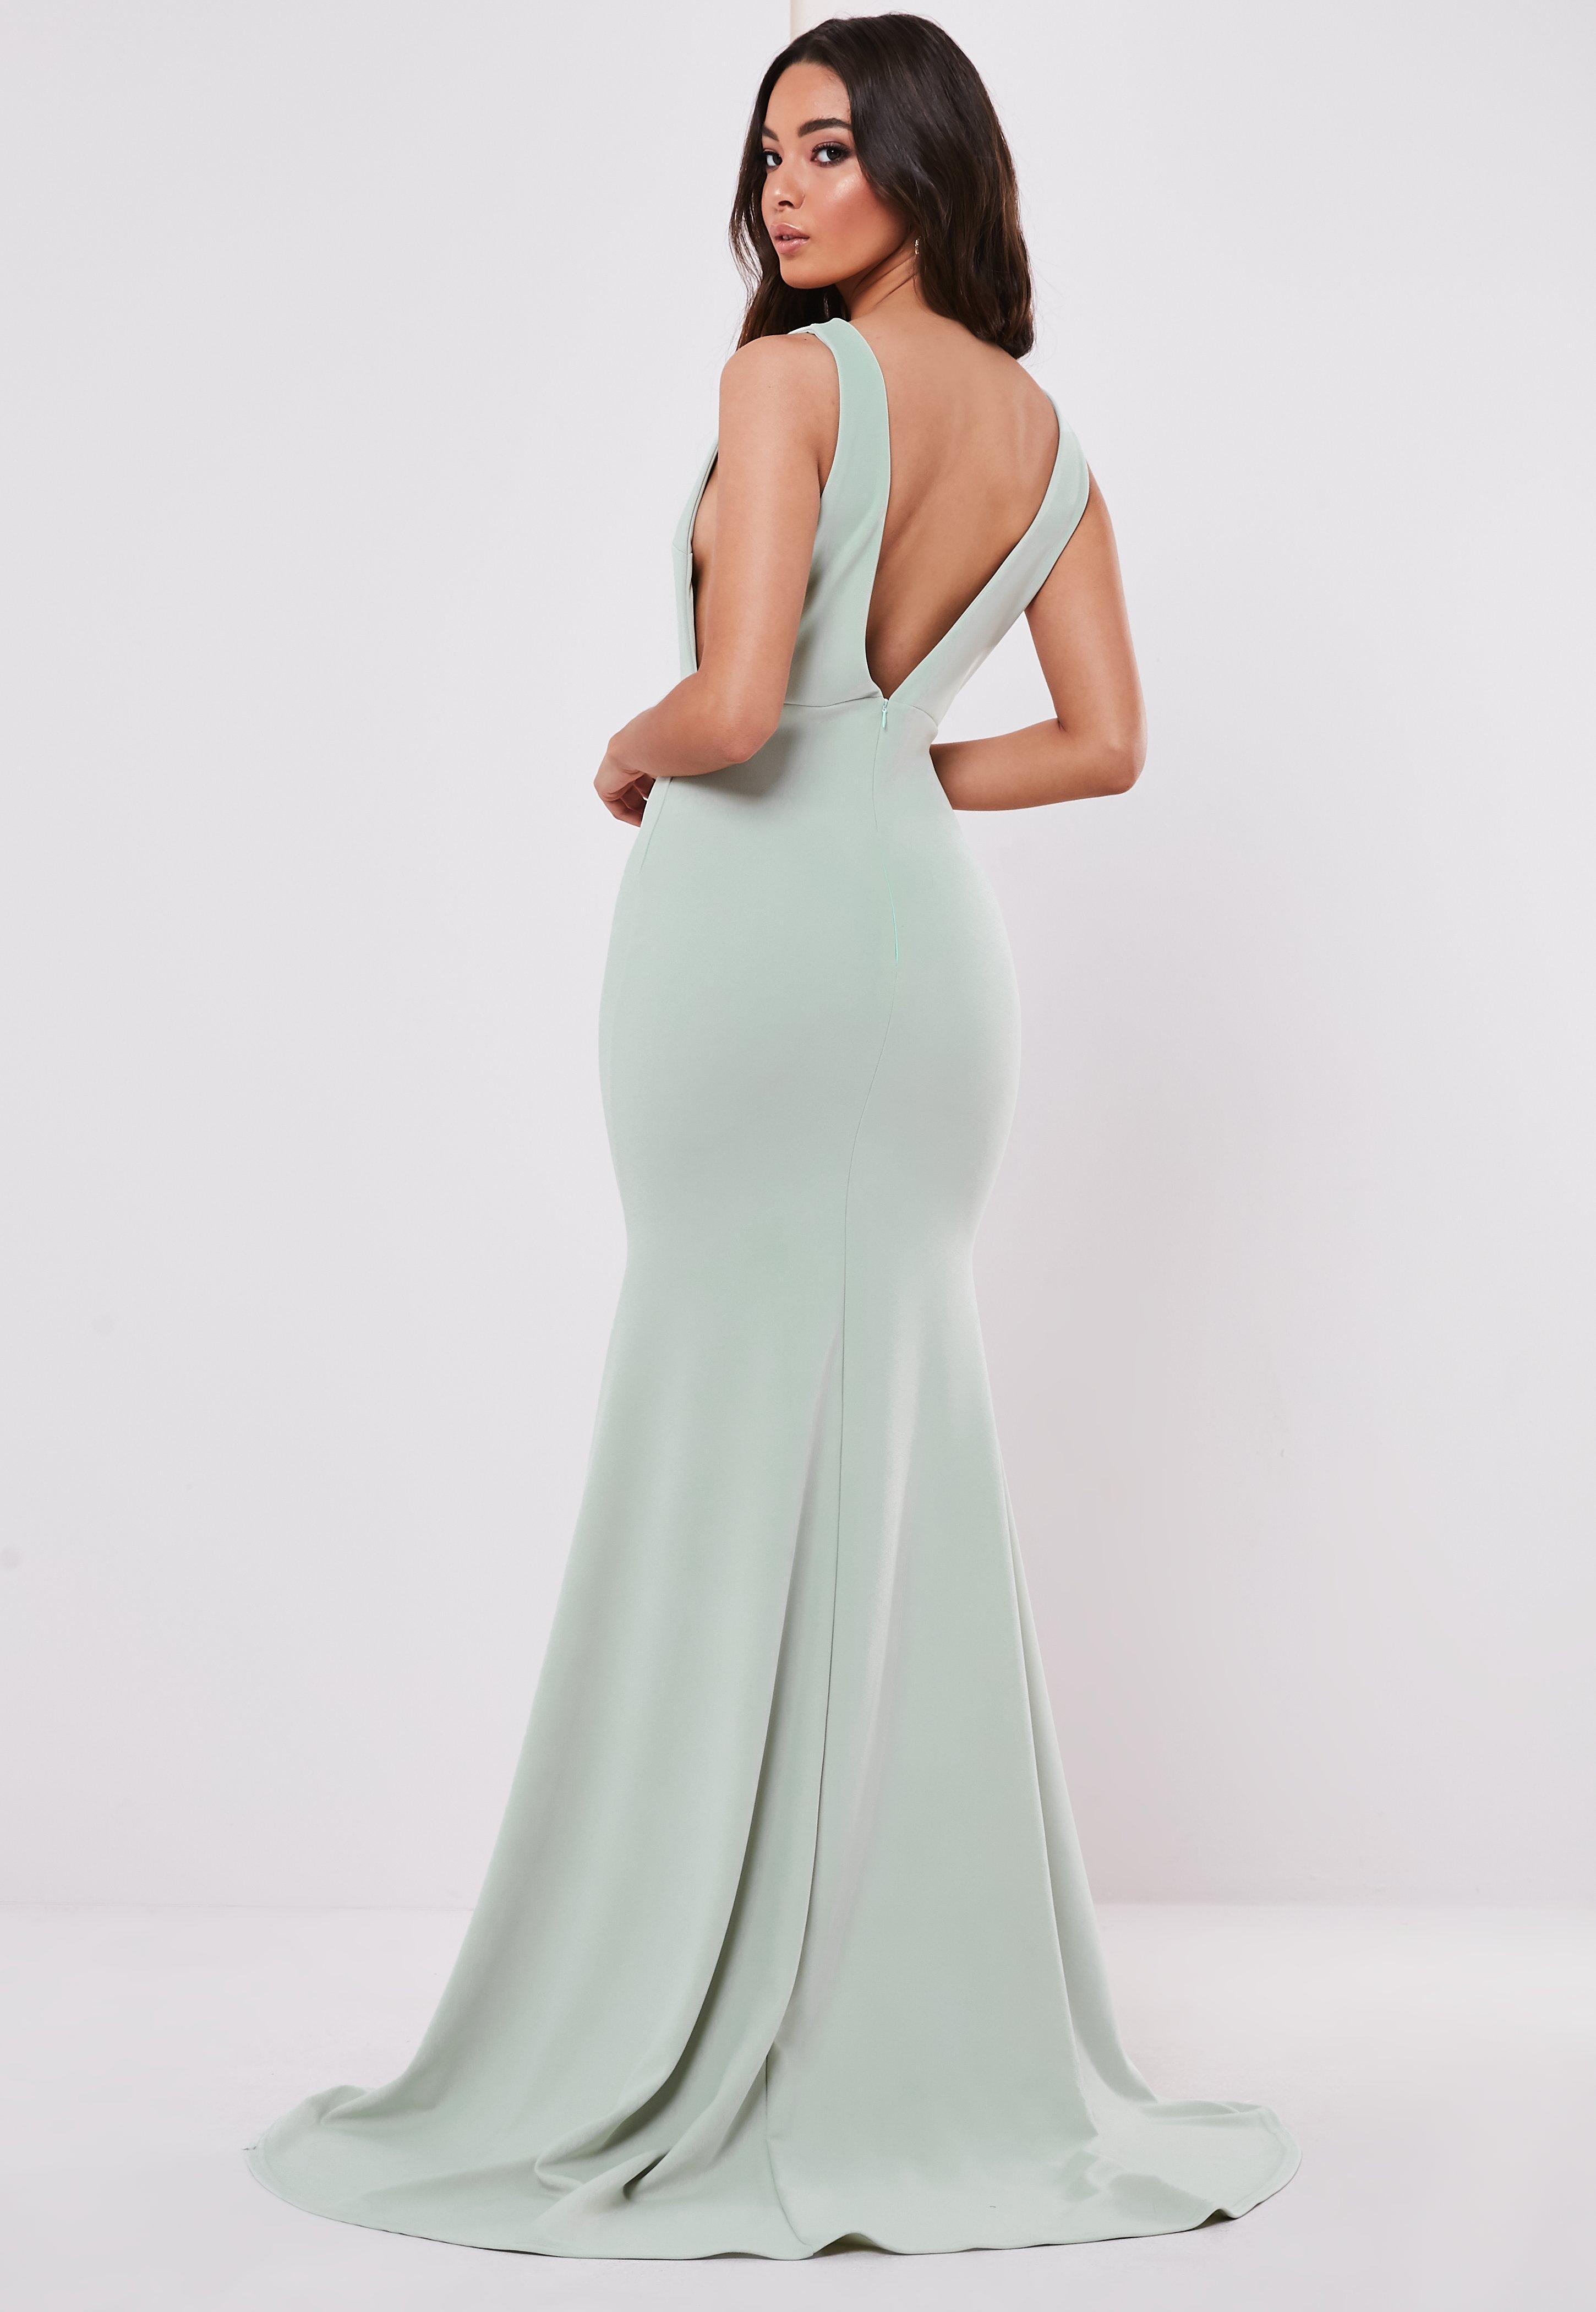 63672a1703f8 Emerald Green Criss Cross Back Frill Hem Bodycon Dress